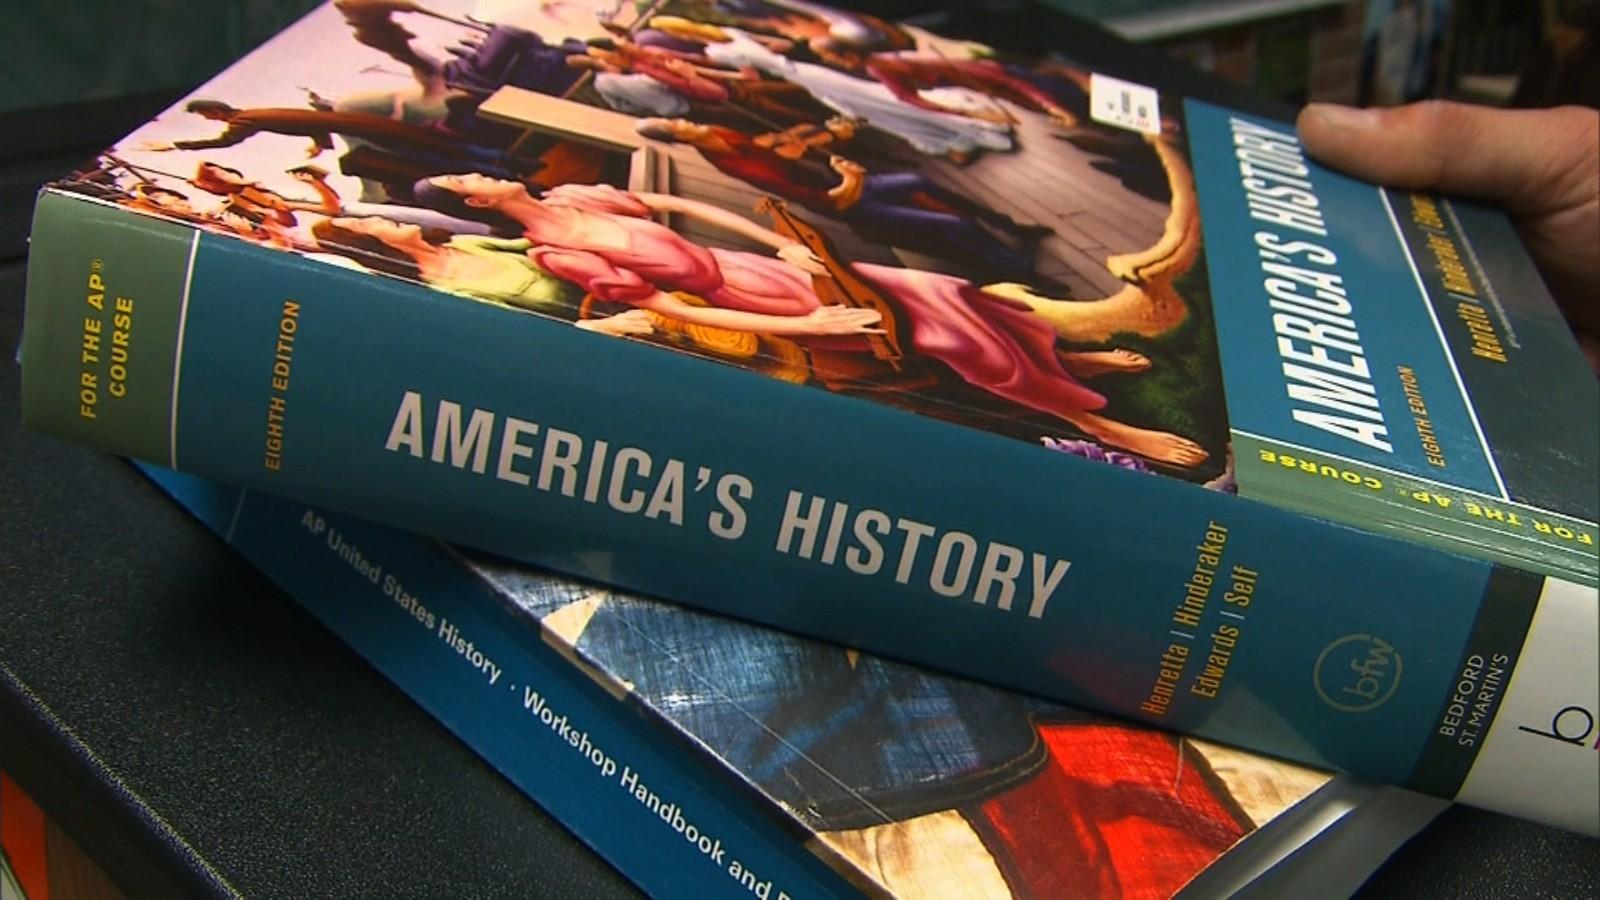 us history dbq essays regents Write an essay in apa format generator coursework essays uk youtube essay about history august 2007 essay regents dbq us august 2007 us history regents dbq.